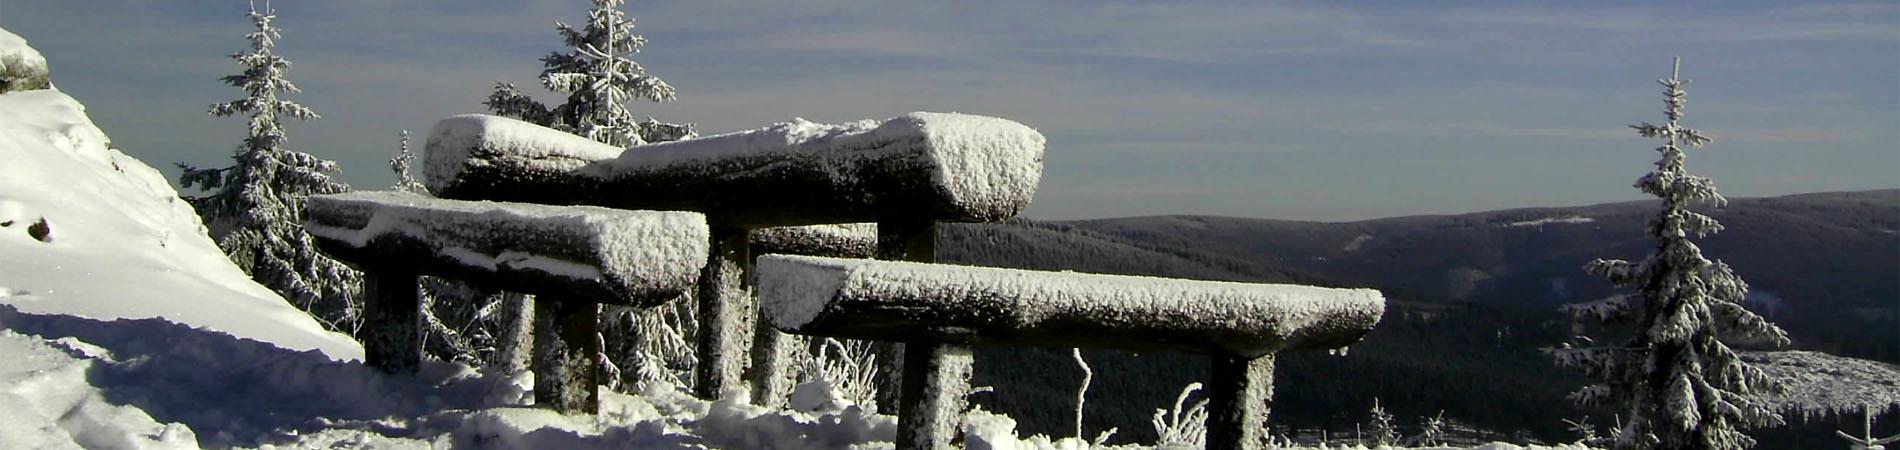 winter_bank_schnee.jpg